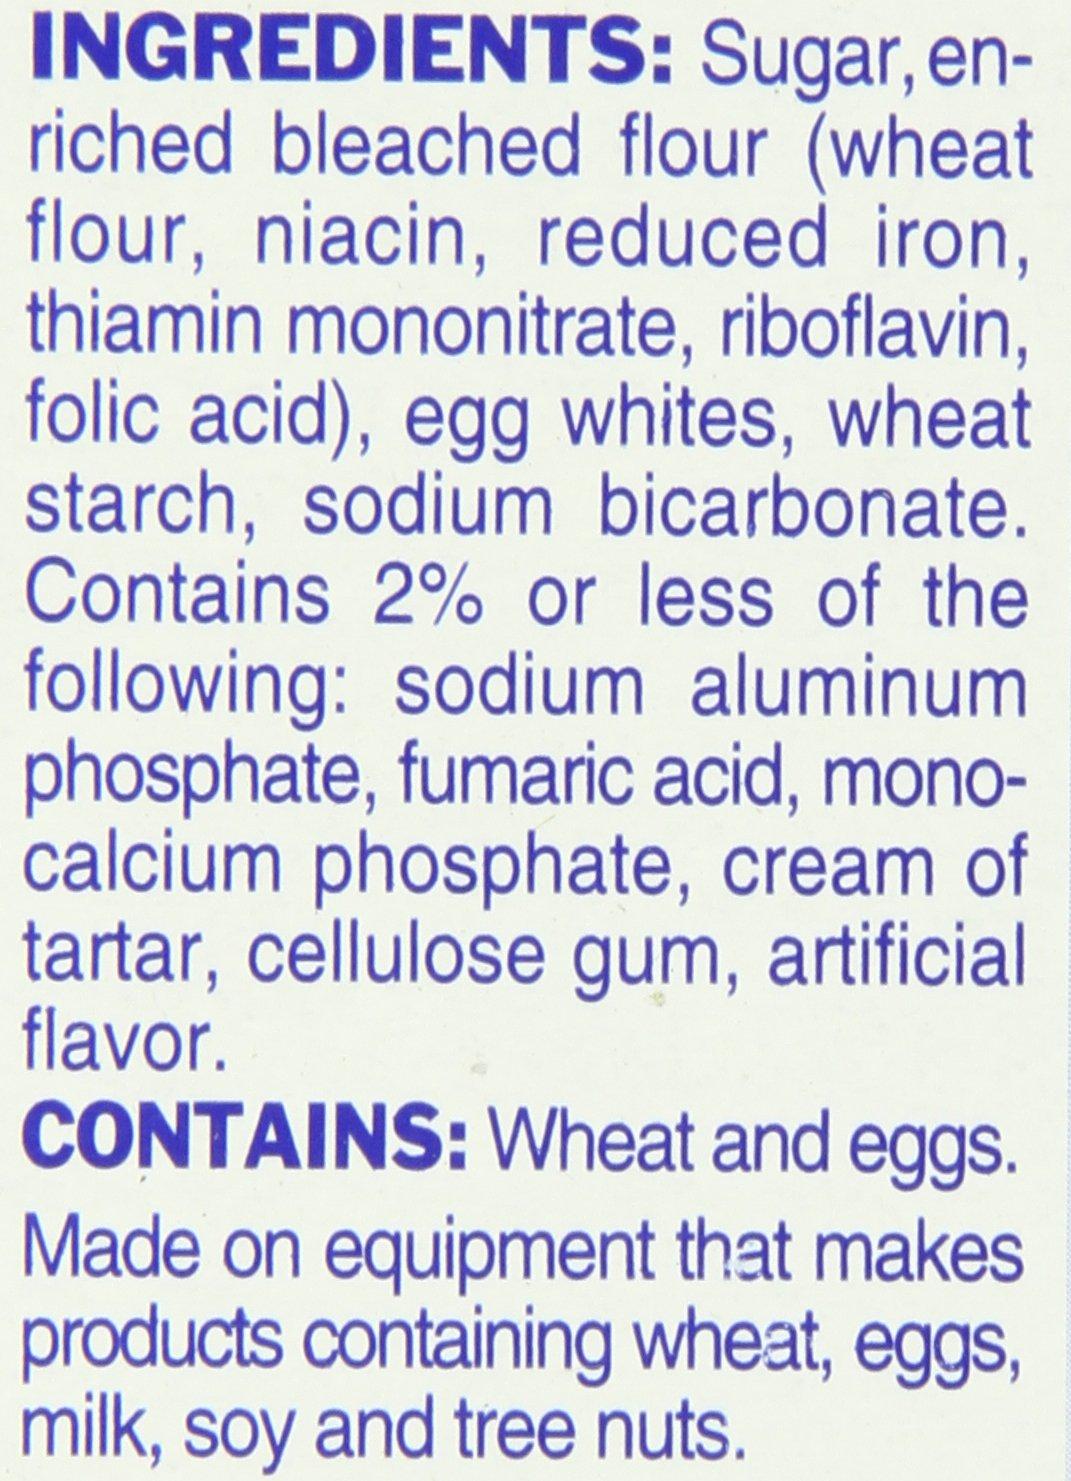 Amazon.com : Krusteaz Angel Food Cake Mix, 15 Ounce : Grocery & Gourmet Food